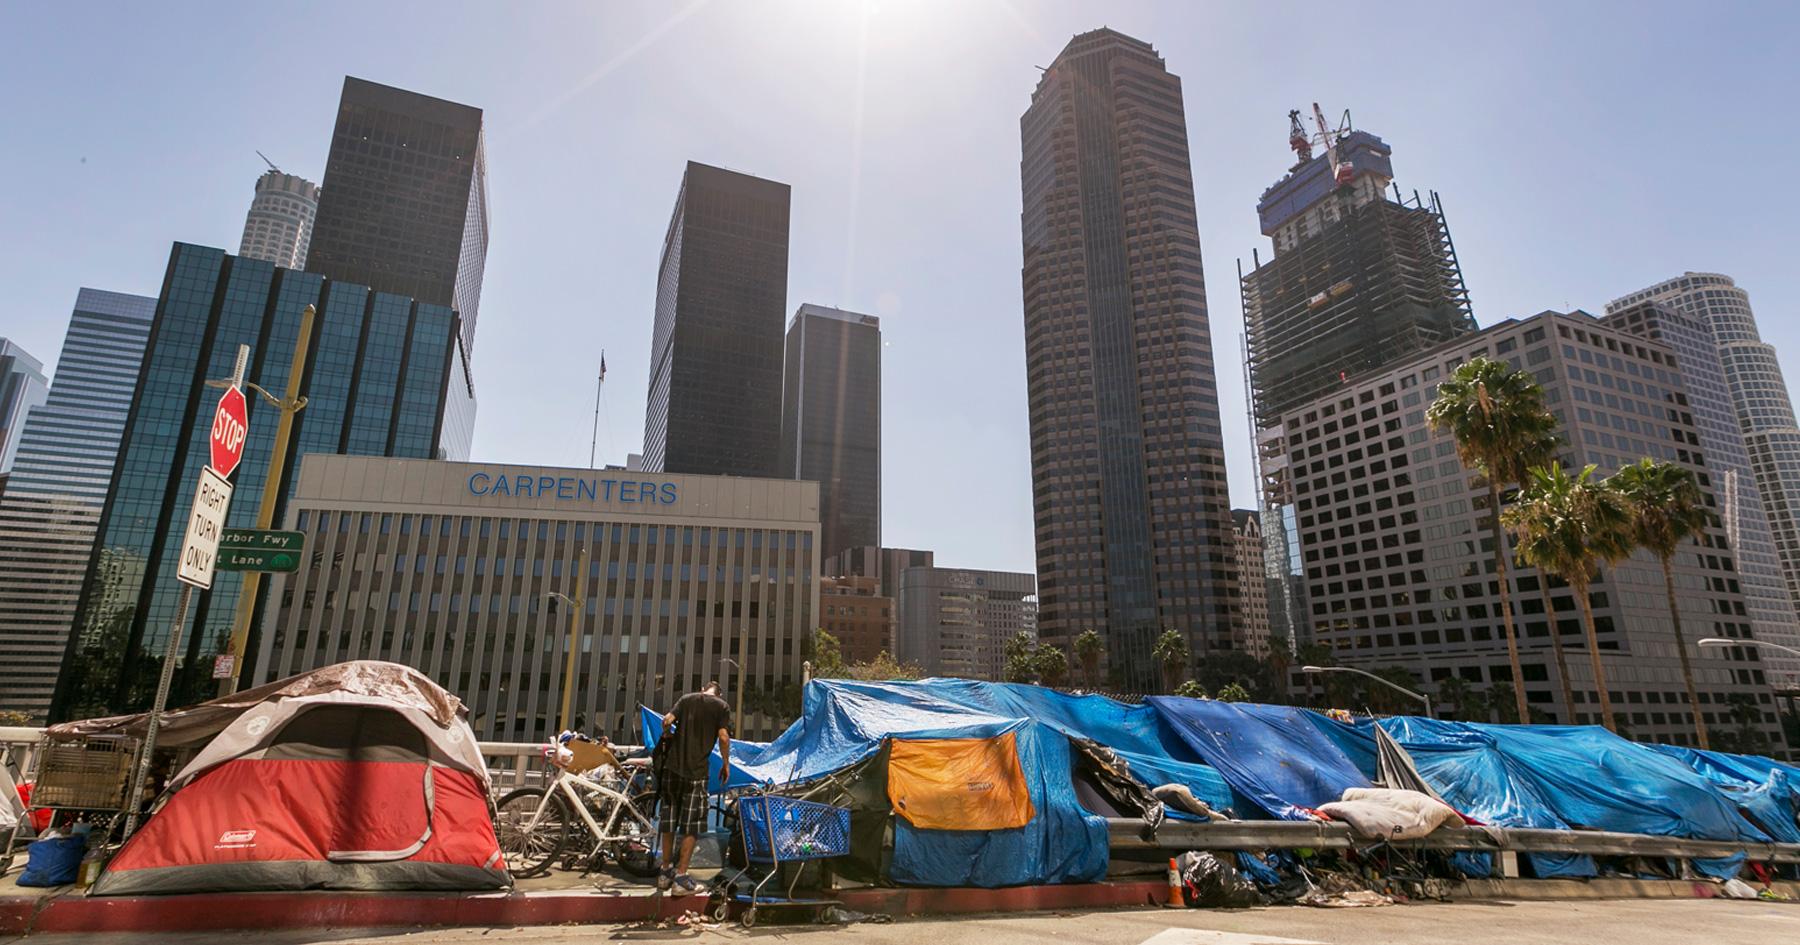 homeless-encampment-in-los-angeles